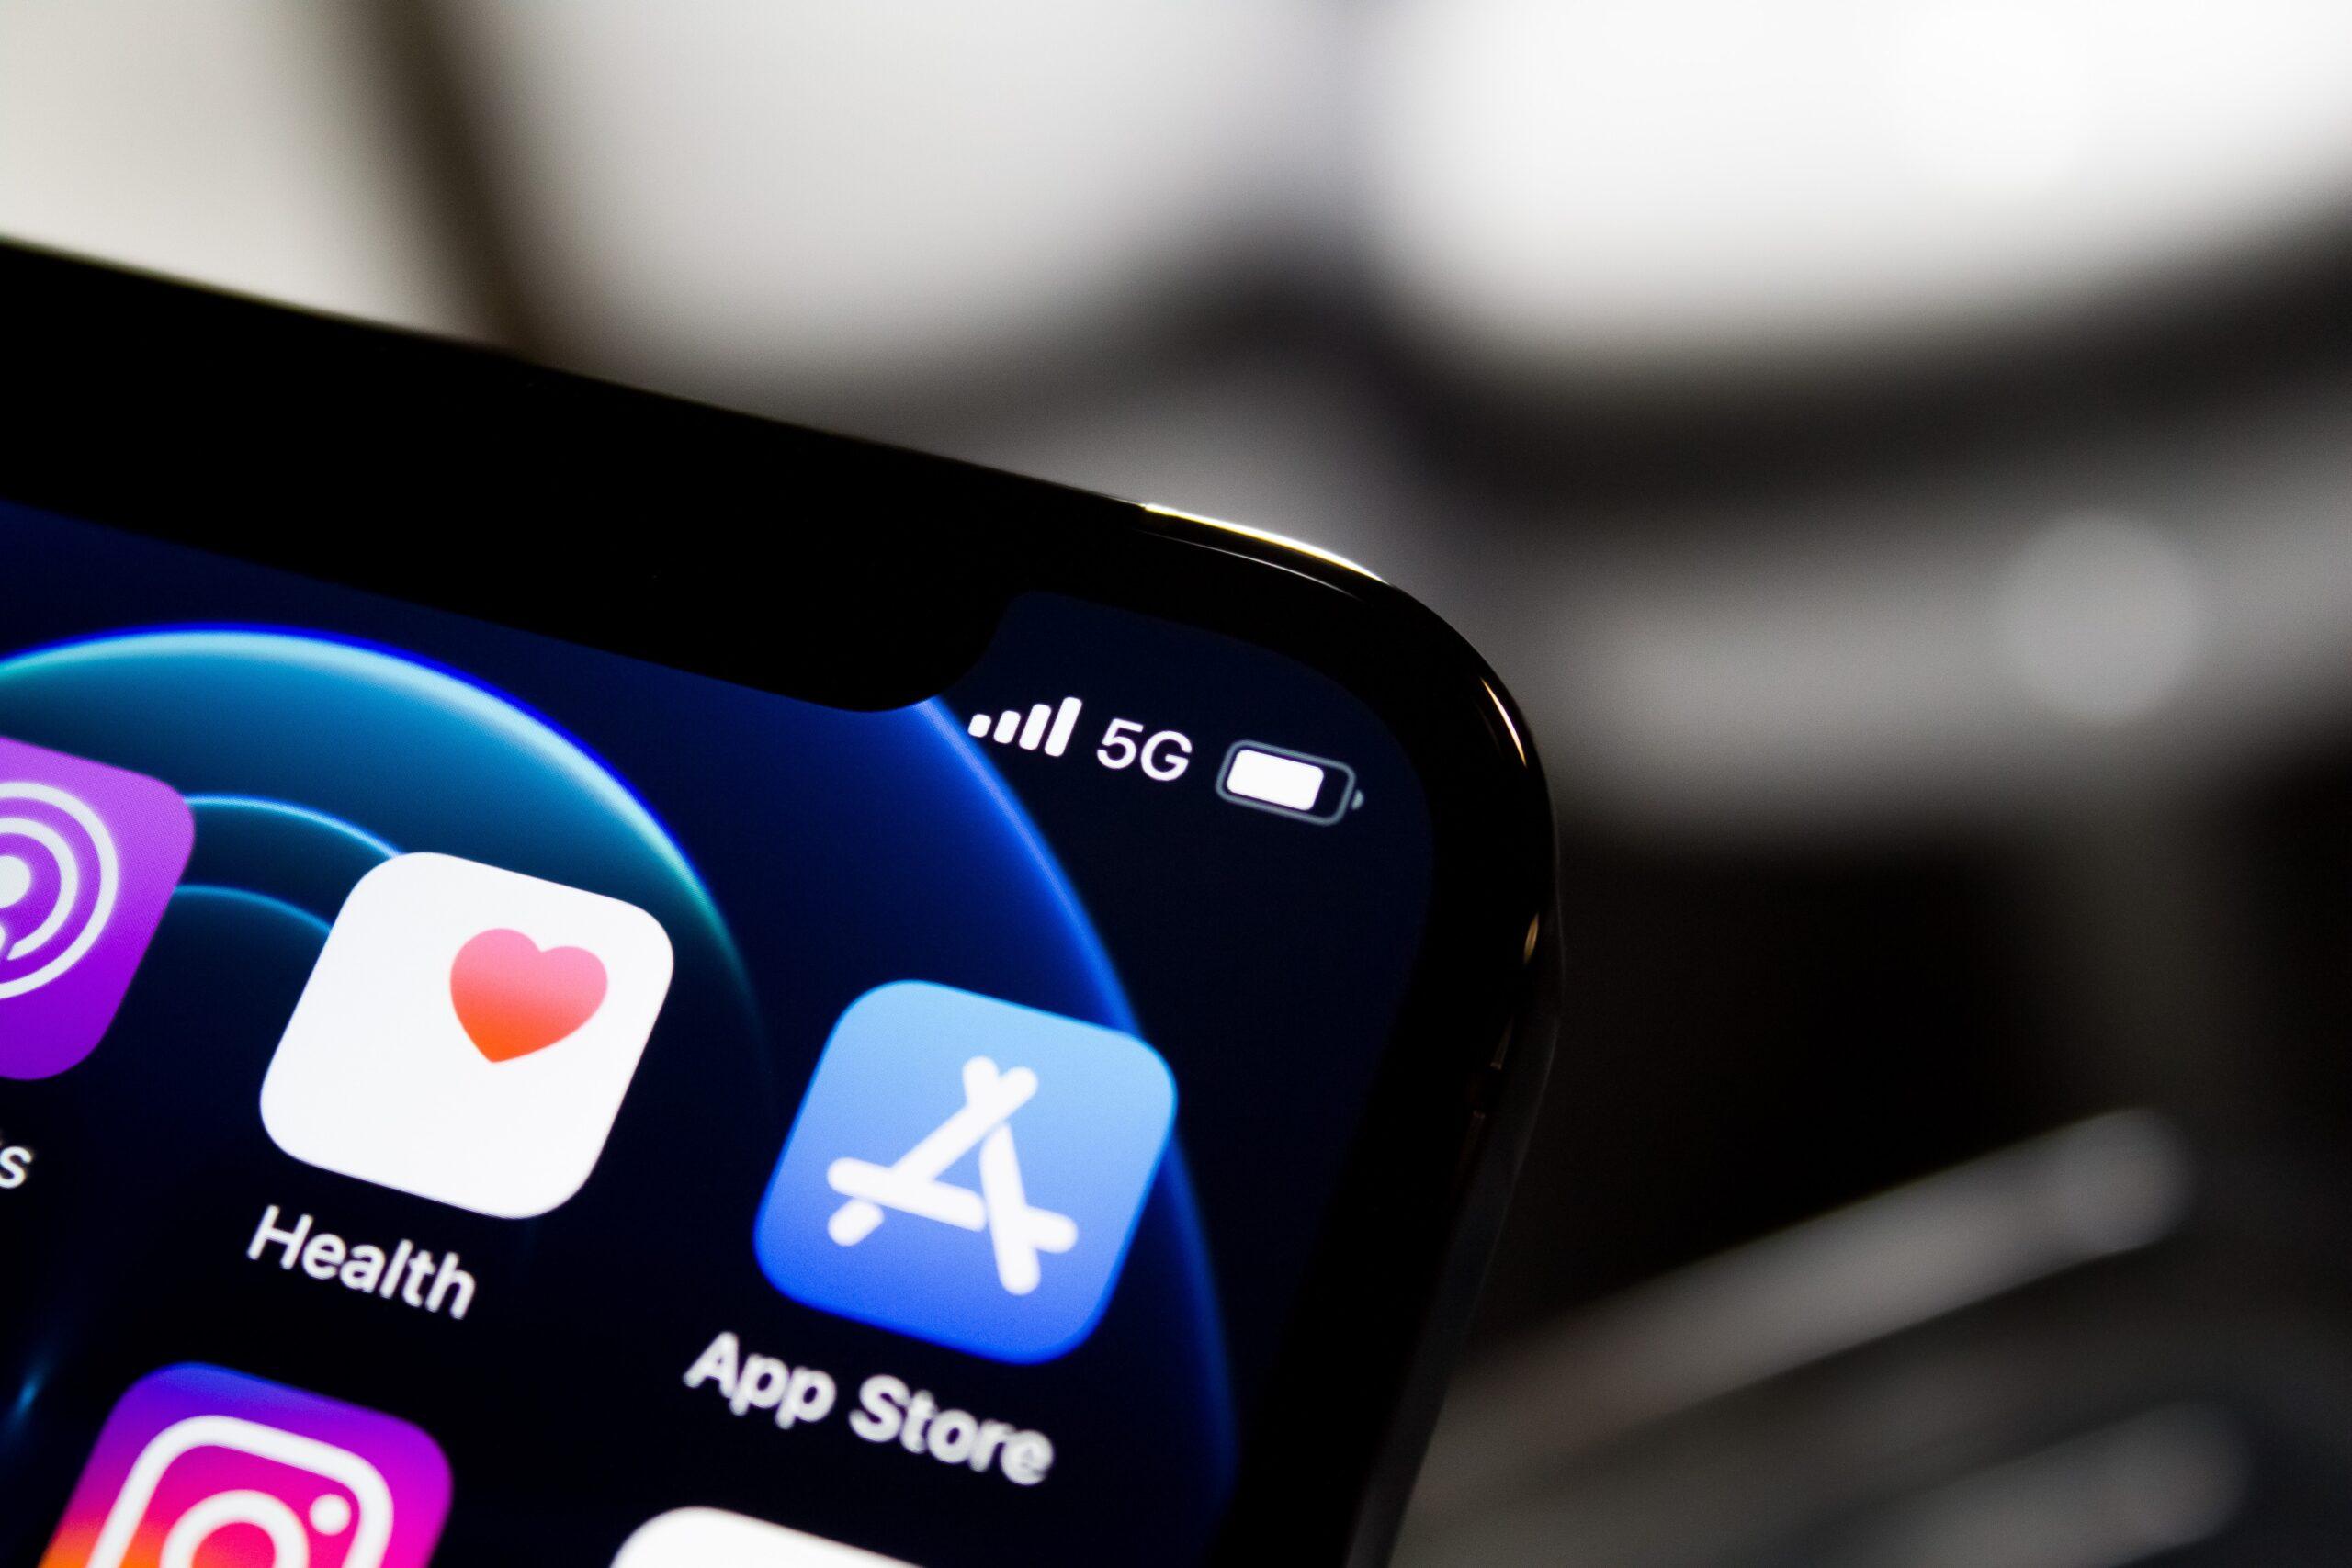 black iphone 4 displaying icons